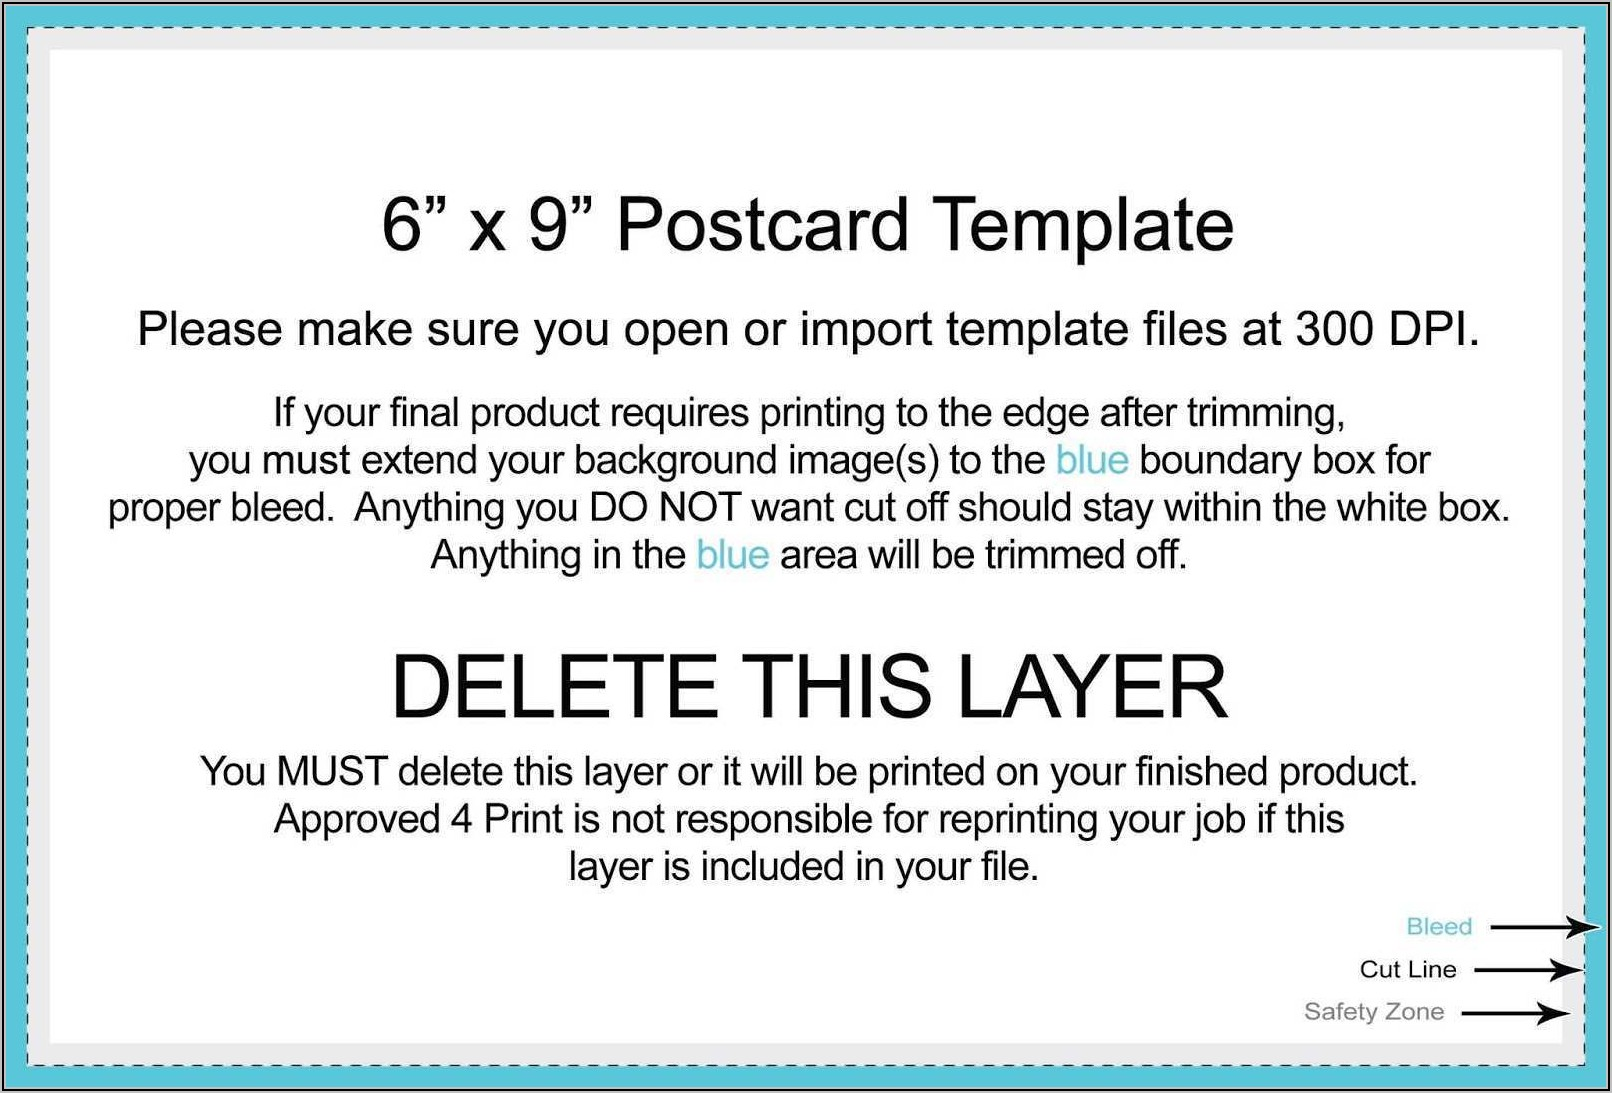 9x6 Postcard Template